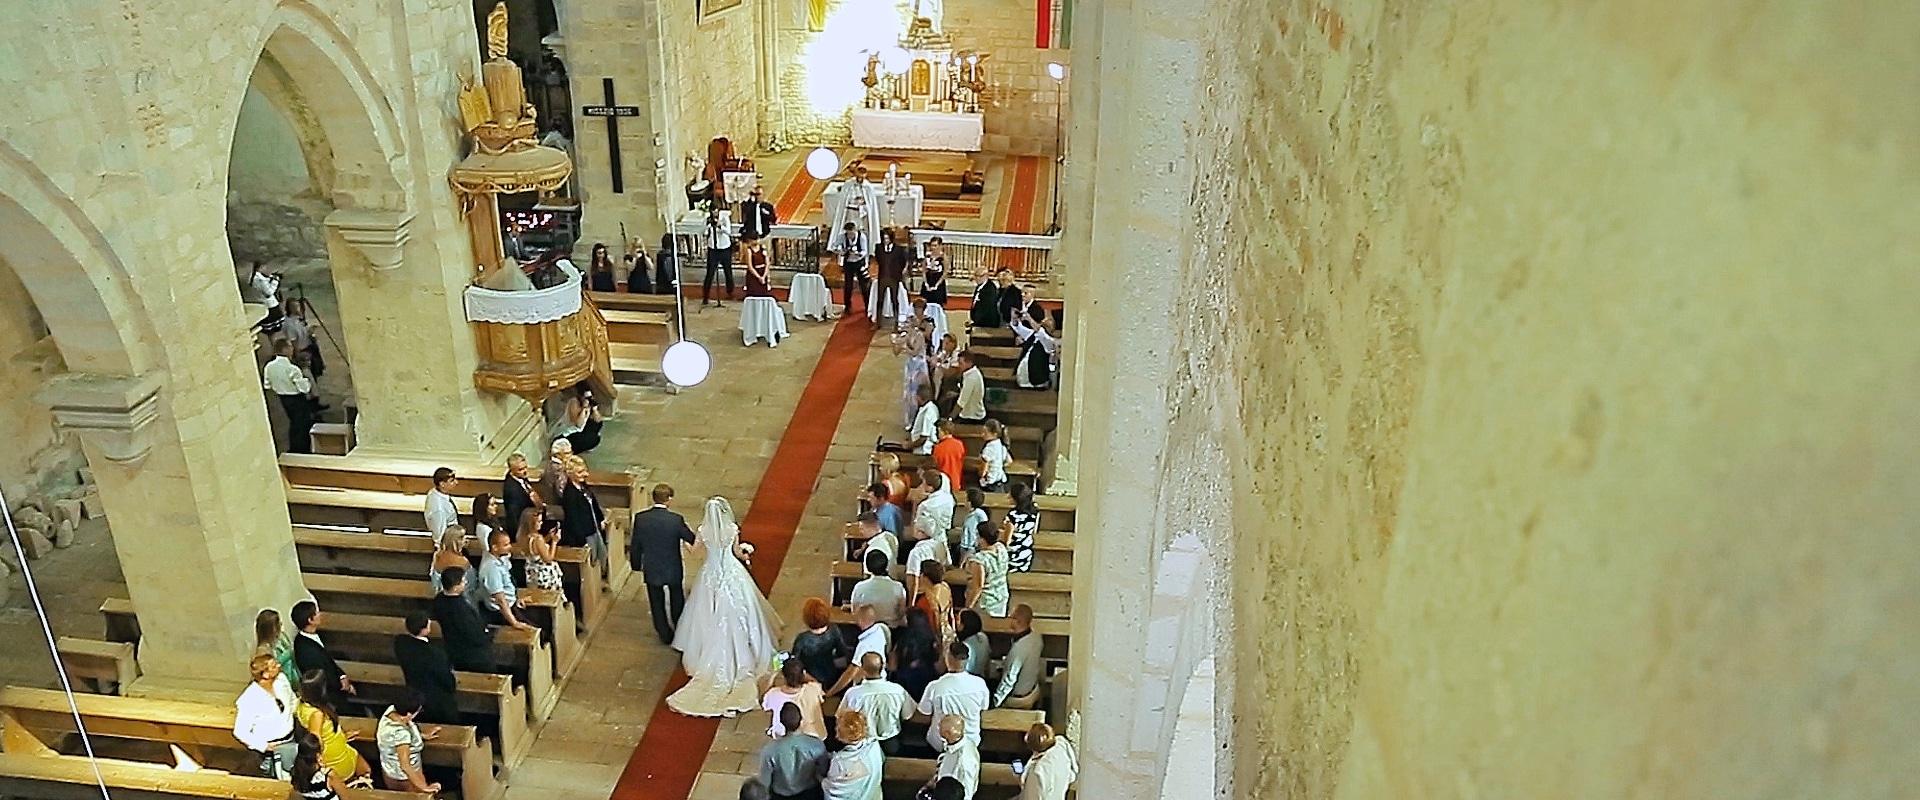 Wedding ceremony at Roman-Catholic church in Belapatfalva, Hungary